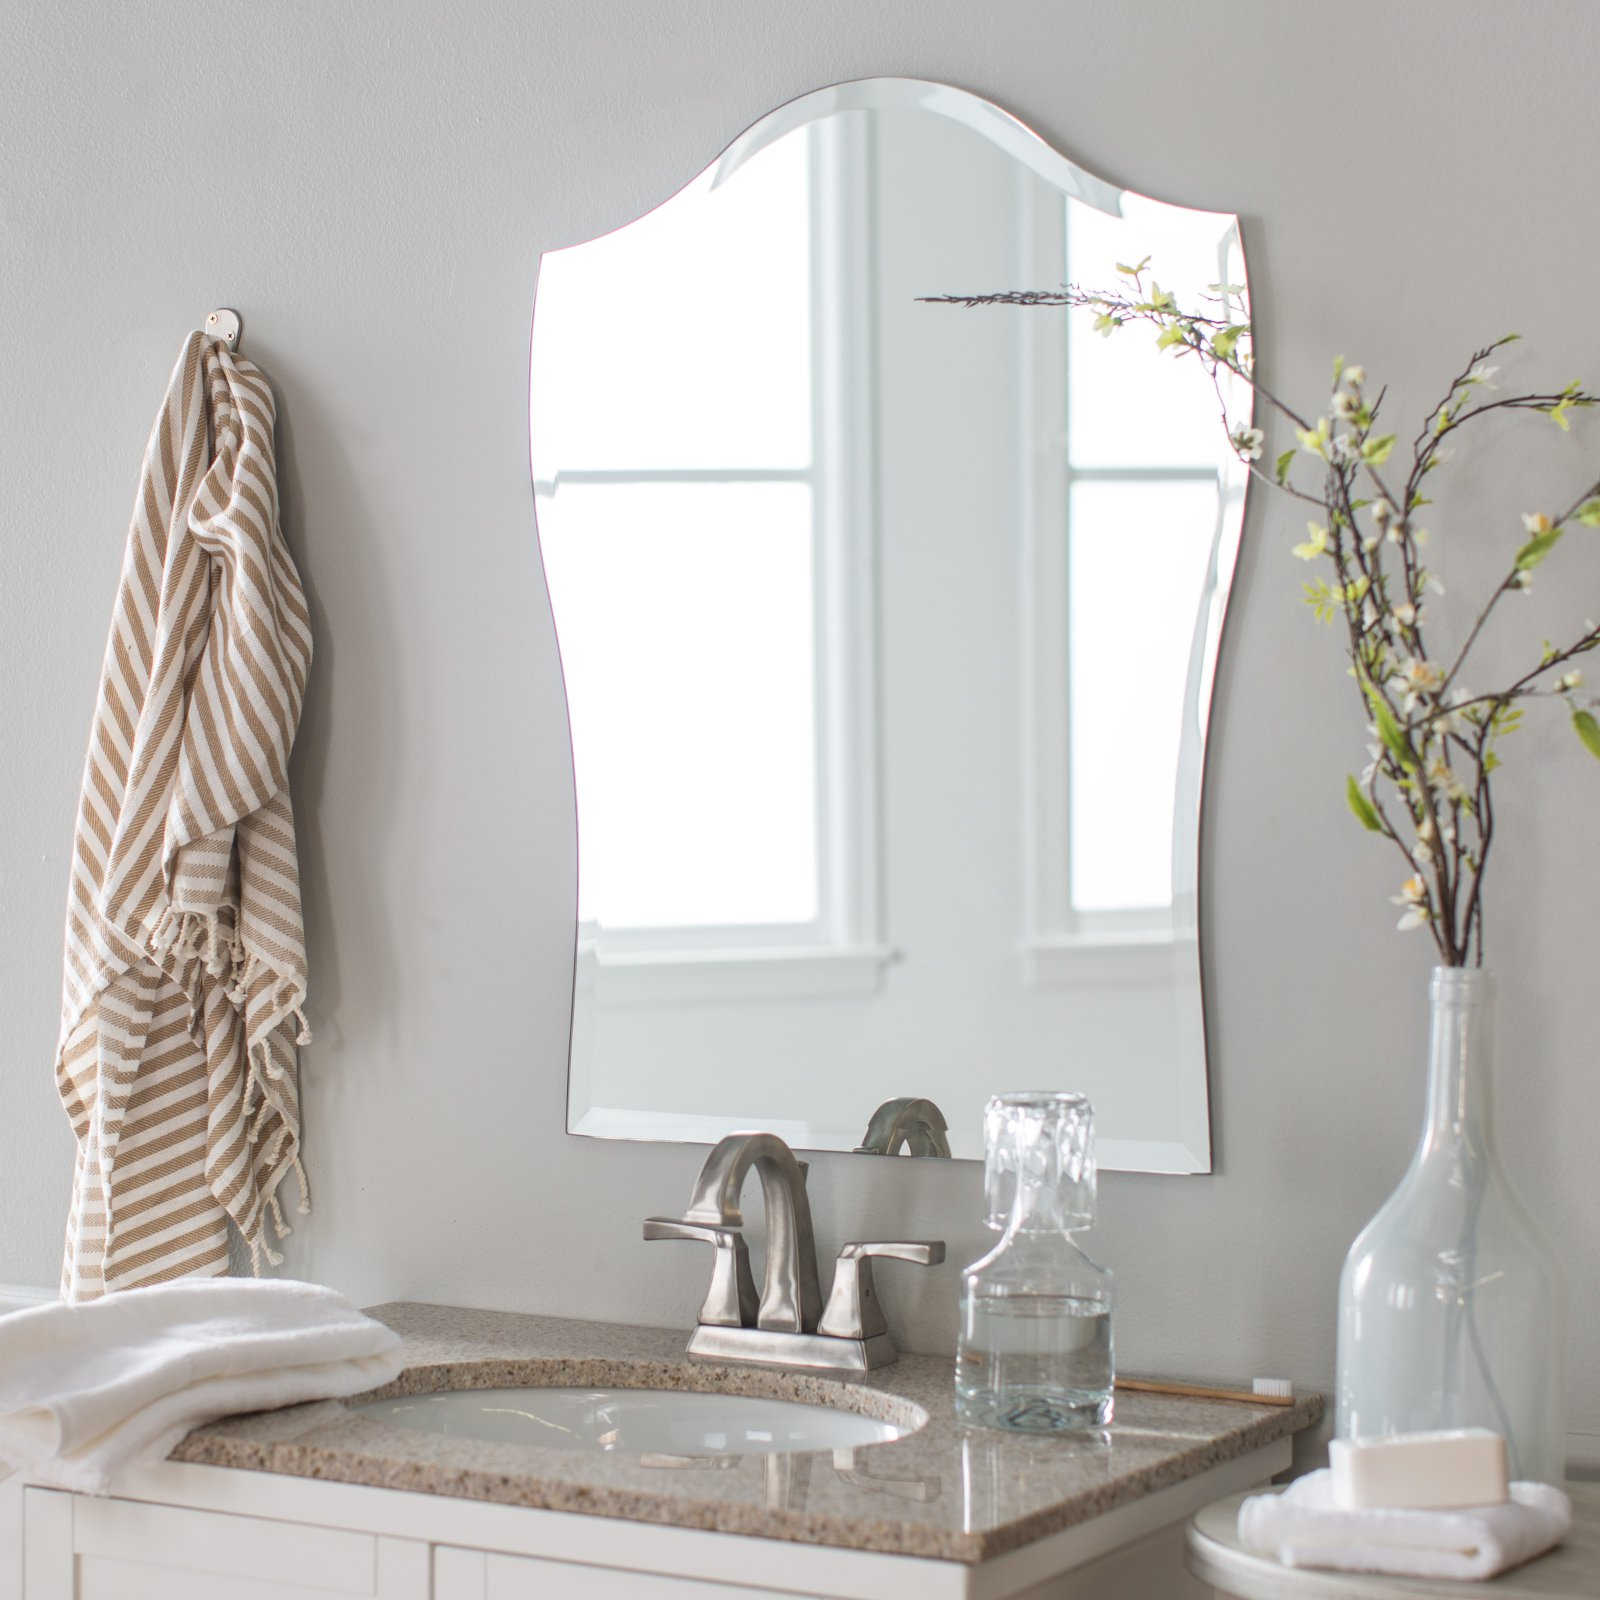 Decor Wonderland Alta Modern Bathroom Mirror 19.7W x 31.5H in. by